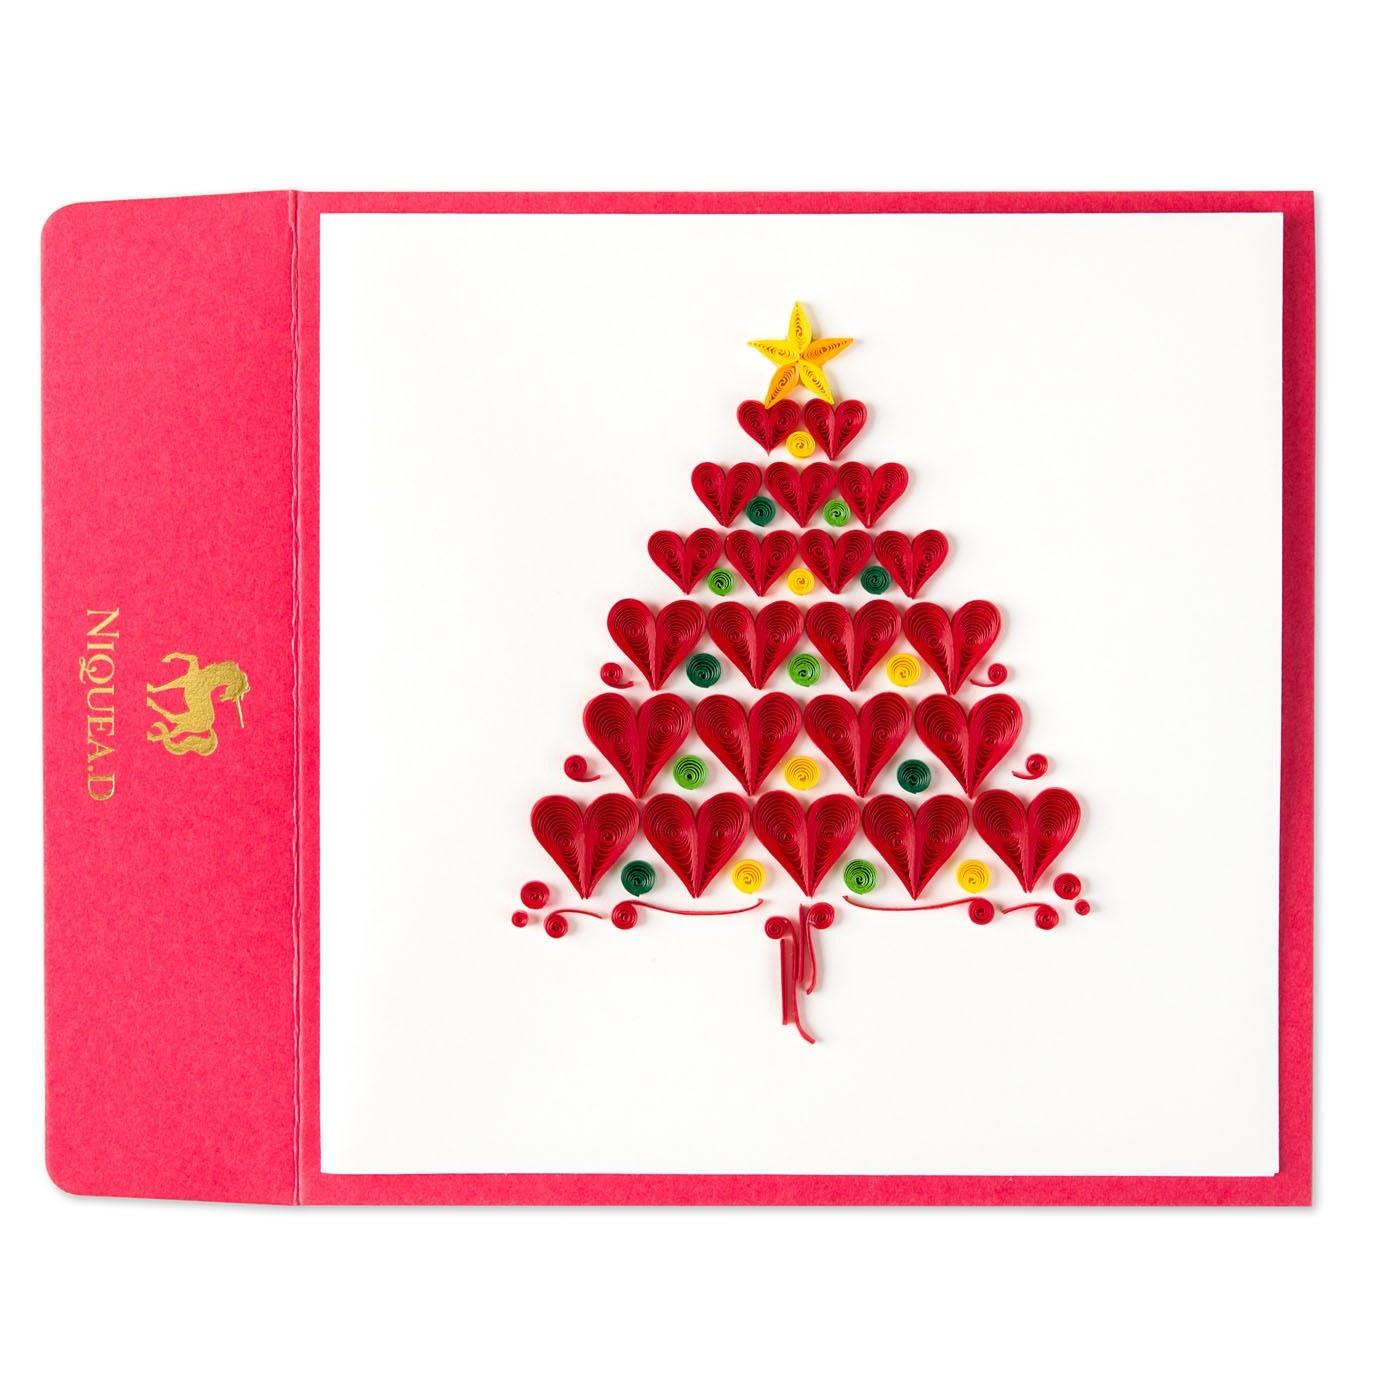 Free Printable Romantic Christmas Cards – Festival Collections - Free Printable Romantic Christmas Cards